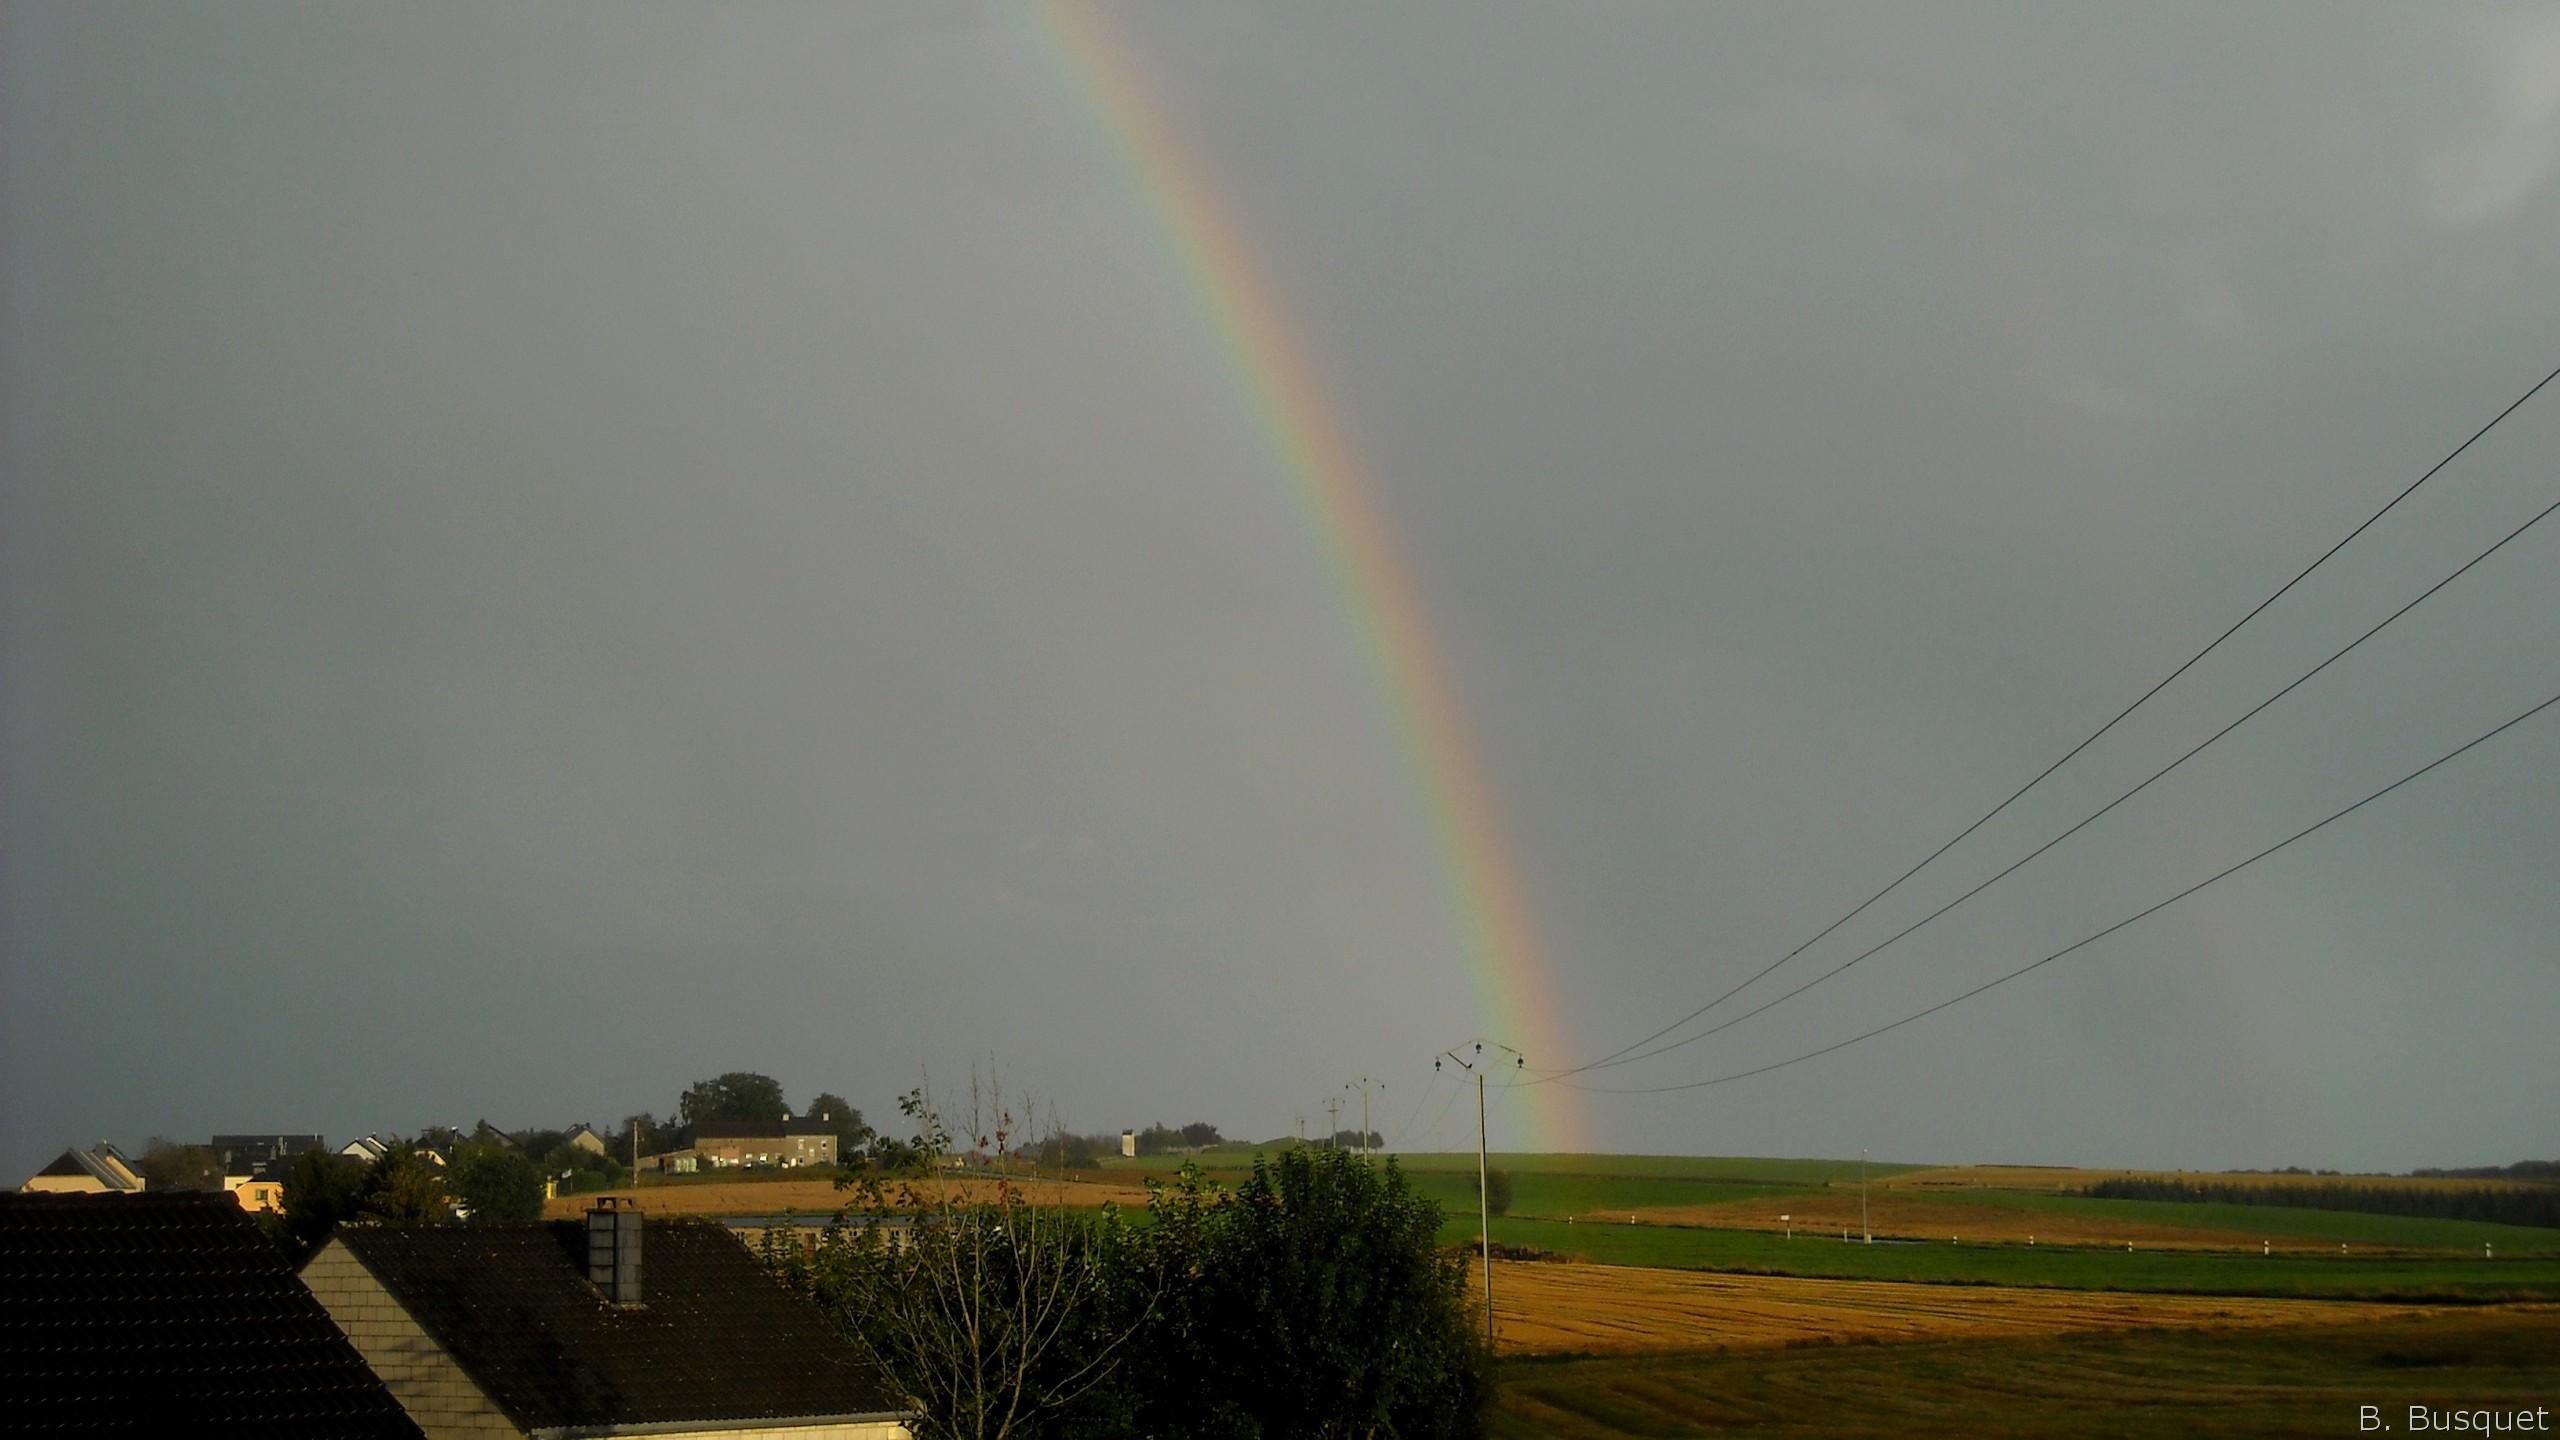 Hd wallpaper rainbow - Hd Wallpaper With A Rainbow